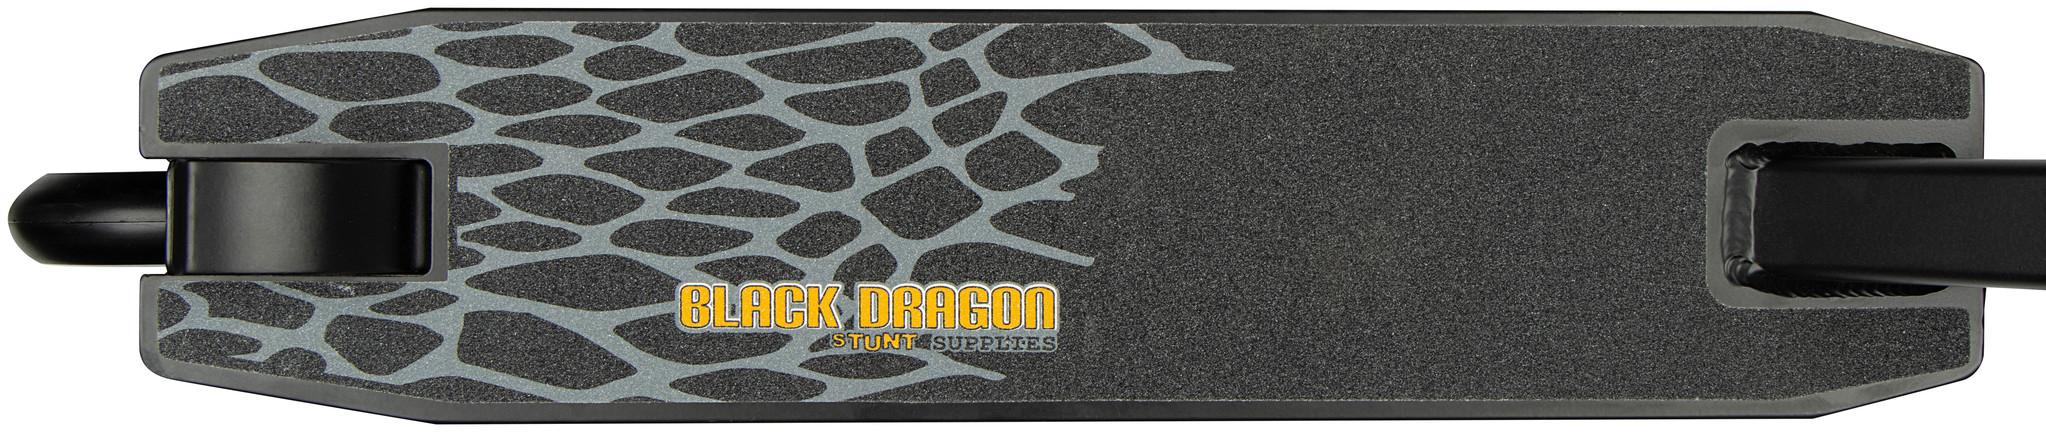 BLACK DRAGON BLACK DRAGON GILDED TARRAGON